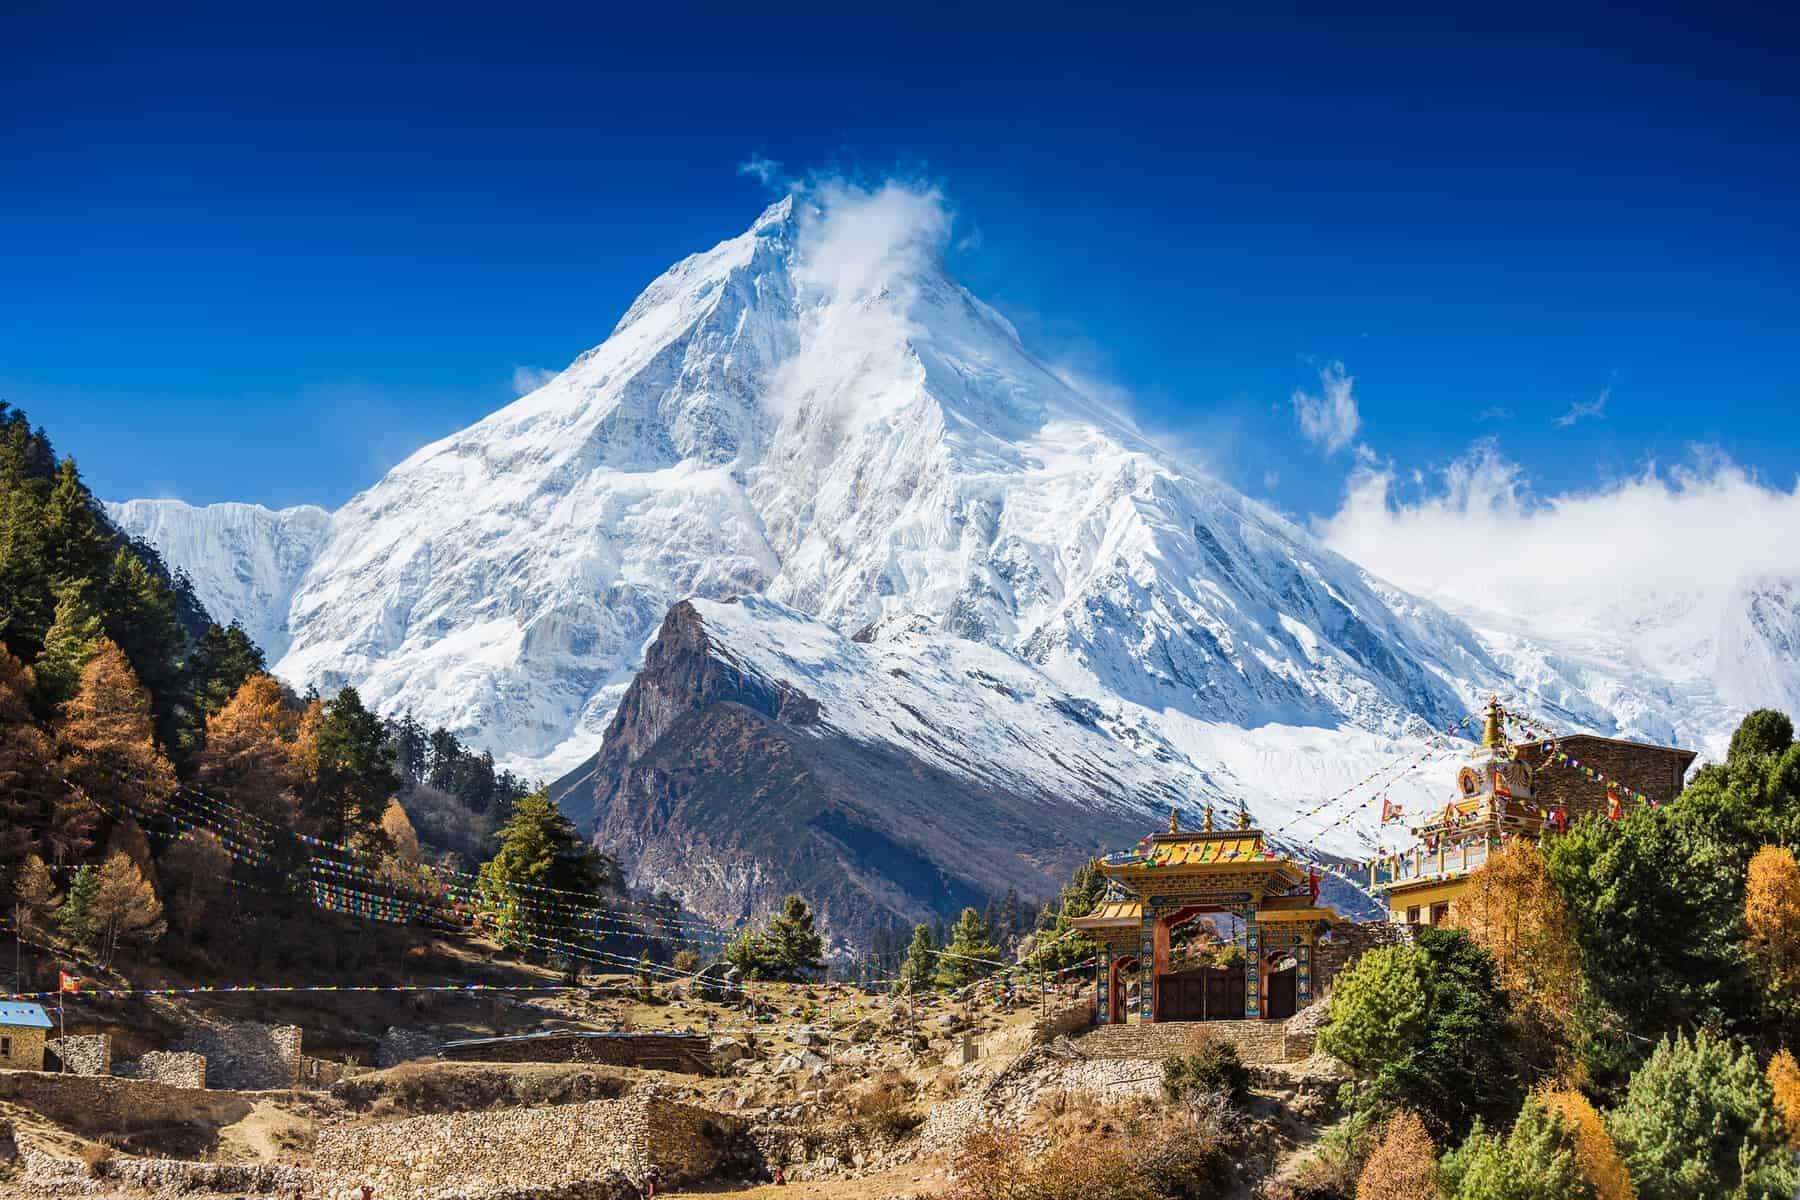 The Himalayas from Tibet